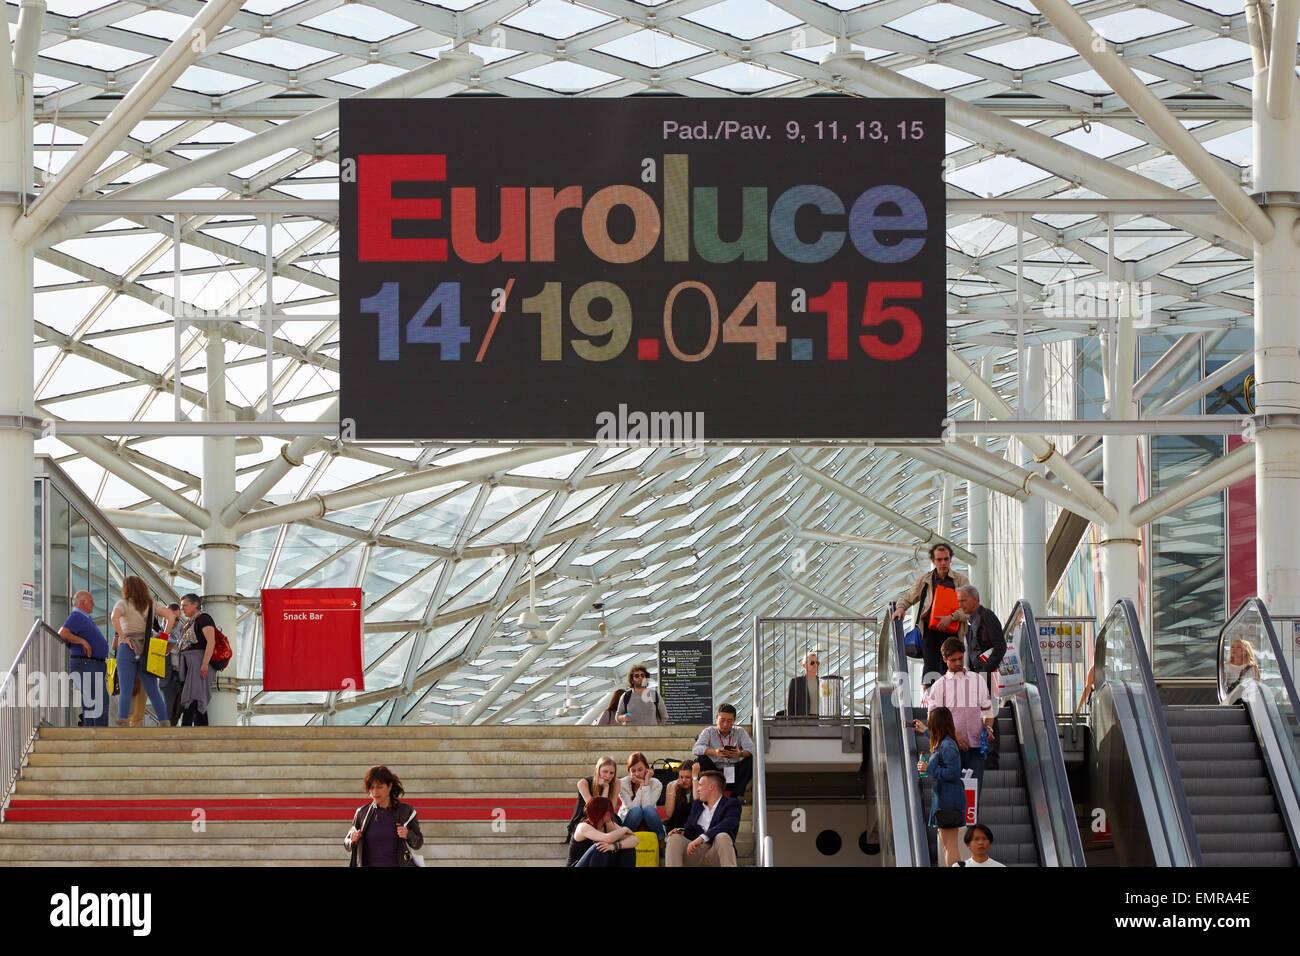 MILAN, ITALY - APRIL 14: Milan Design Week, Euroluce billboard at Salone del Mobile opening on April 15, 2015 in - Stock Image